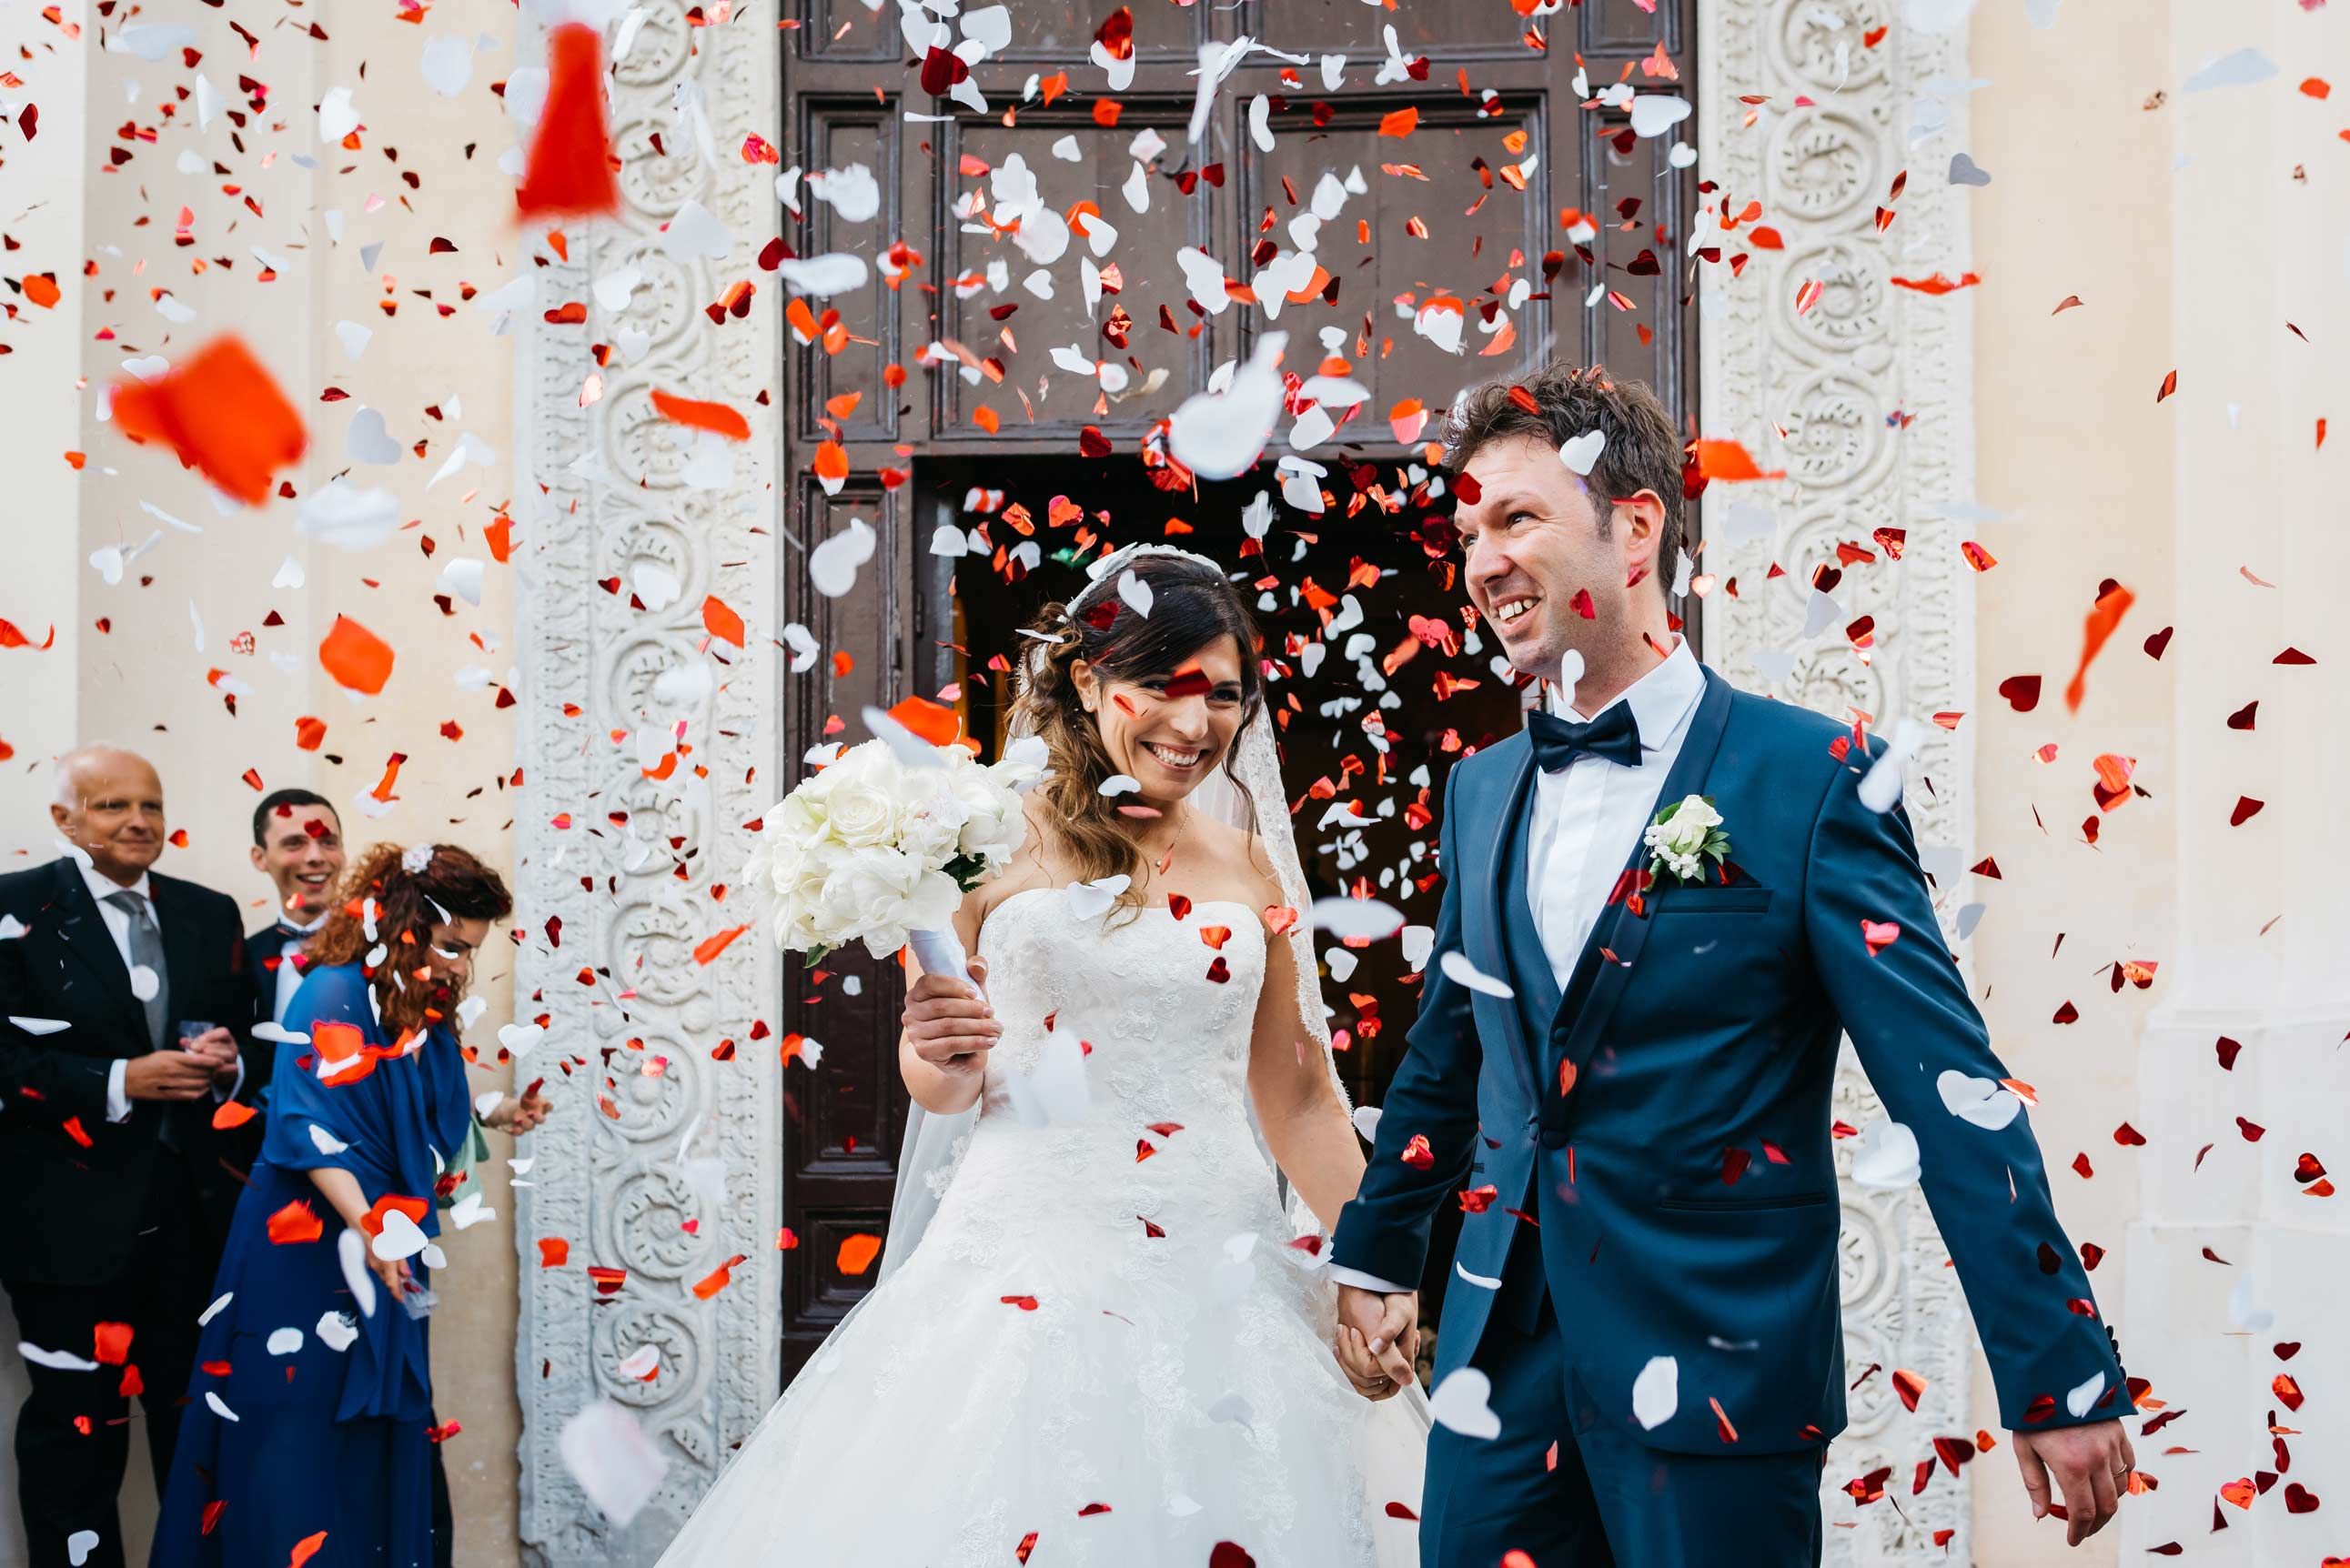 Fotografo-Sposi-Matrimonio-Roma-Reportage-Cerimonia